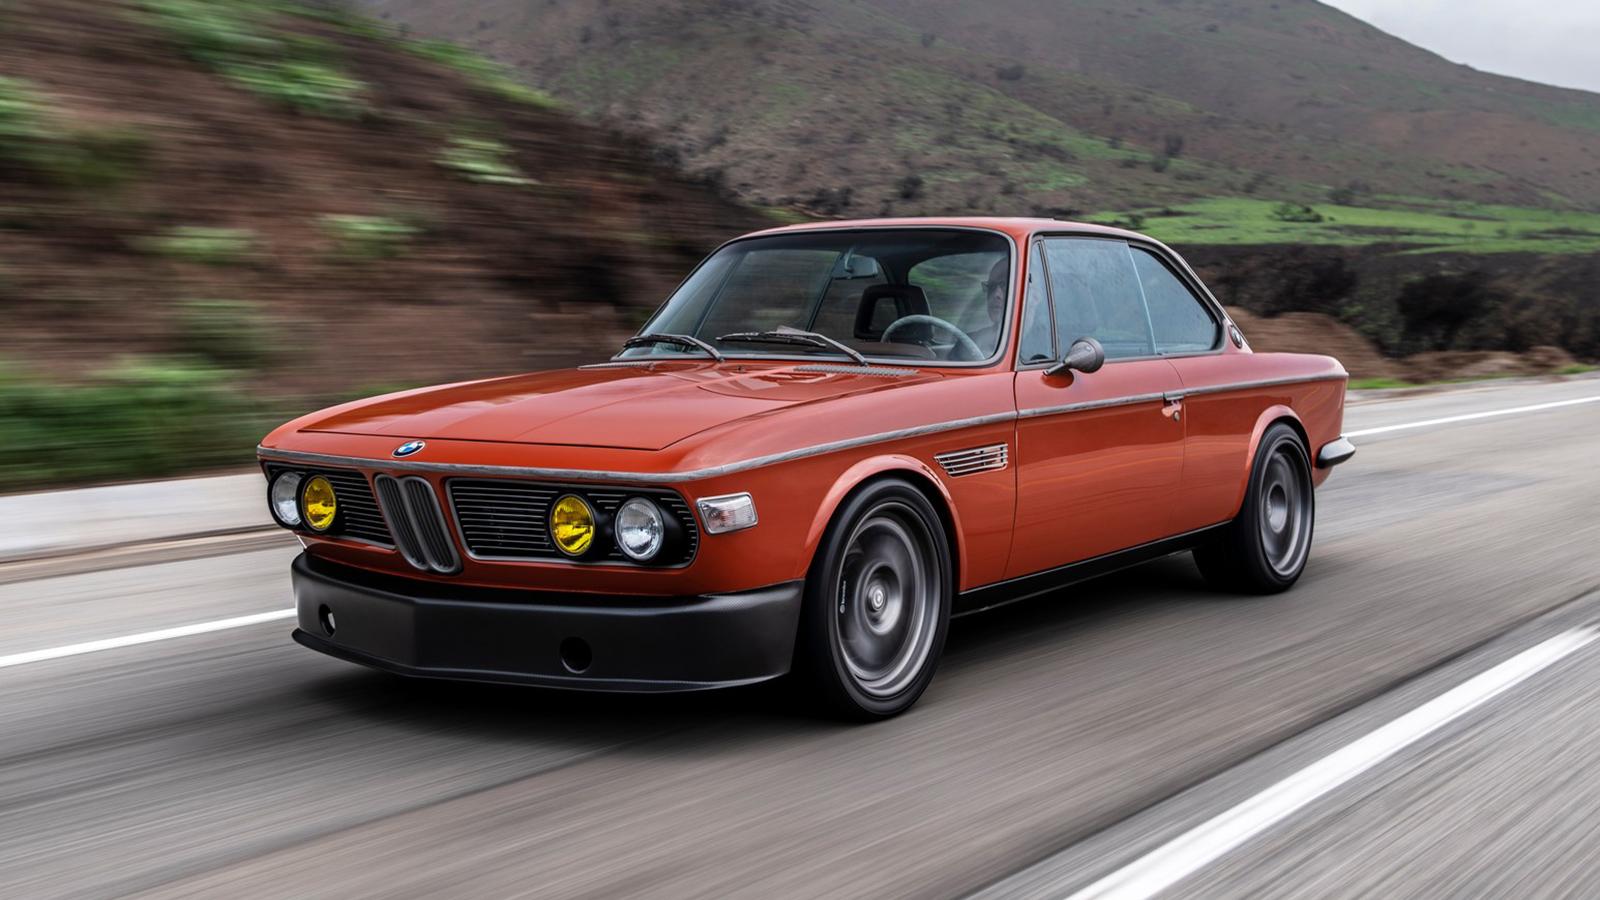 Robert Downey Jr.'s SpeedKore 1974 BMW 3.0 C